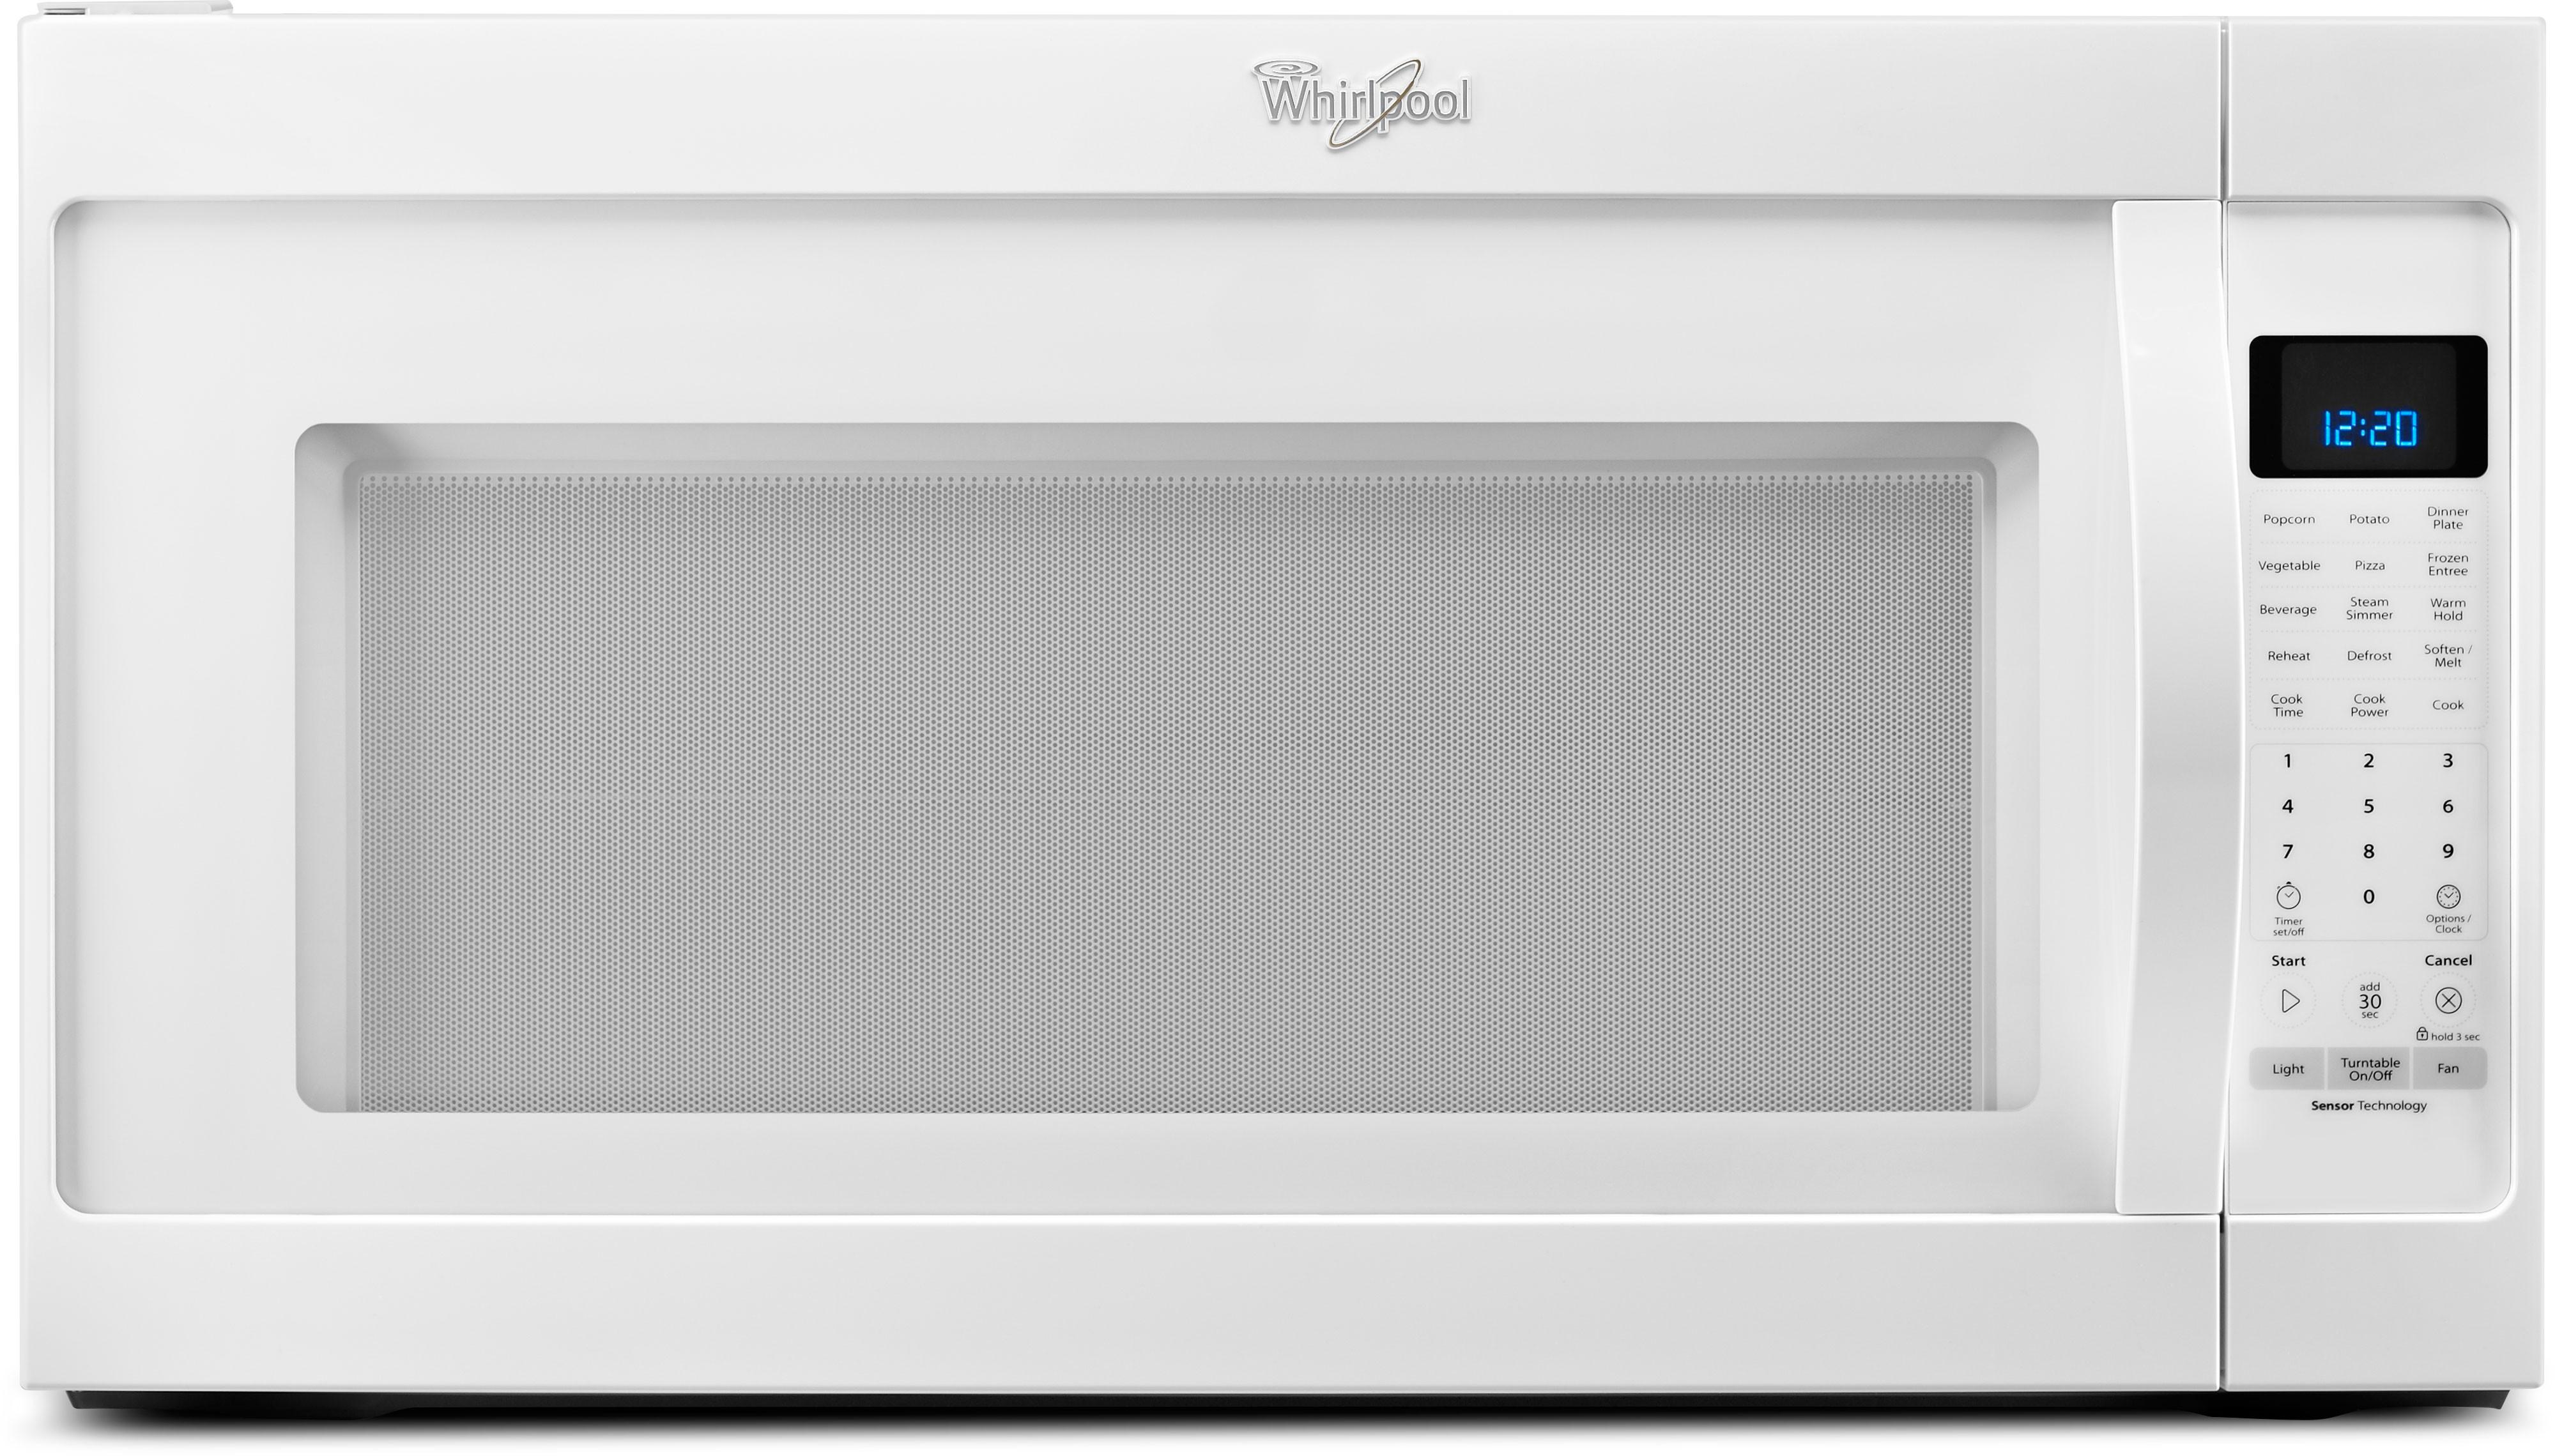 Whirlpool white ice countertop microwave - Whirlpool White Ice Countertop Microwave 24